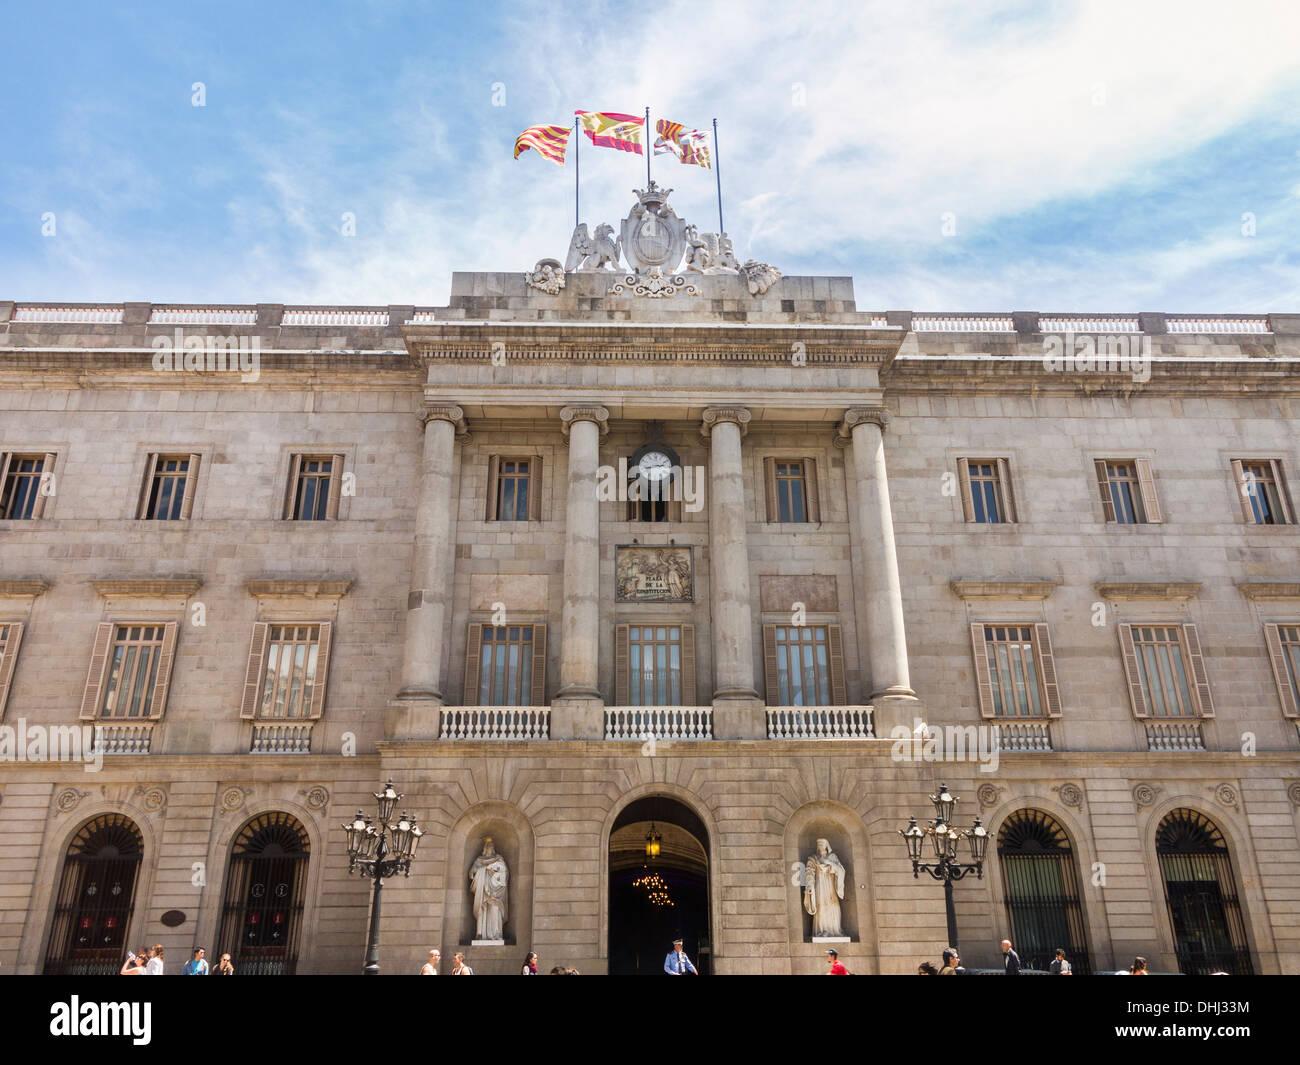 Exterior of the Town Hall or Casa de la Ciutat in Barcelona, Spain - Stock Image